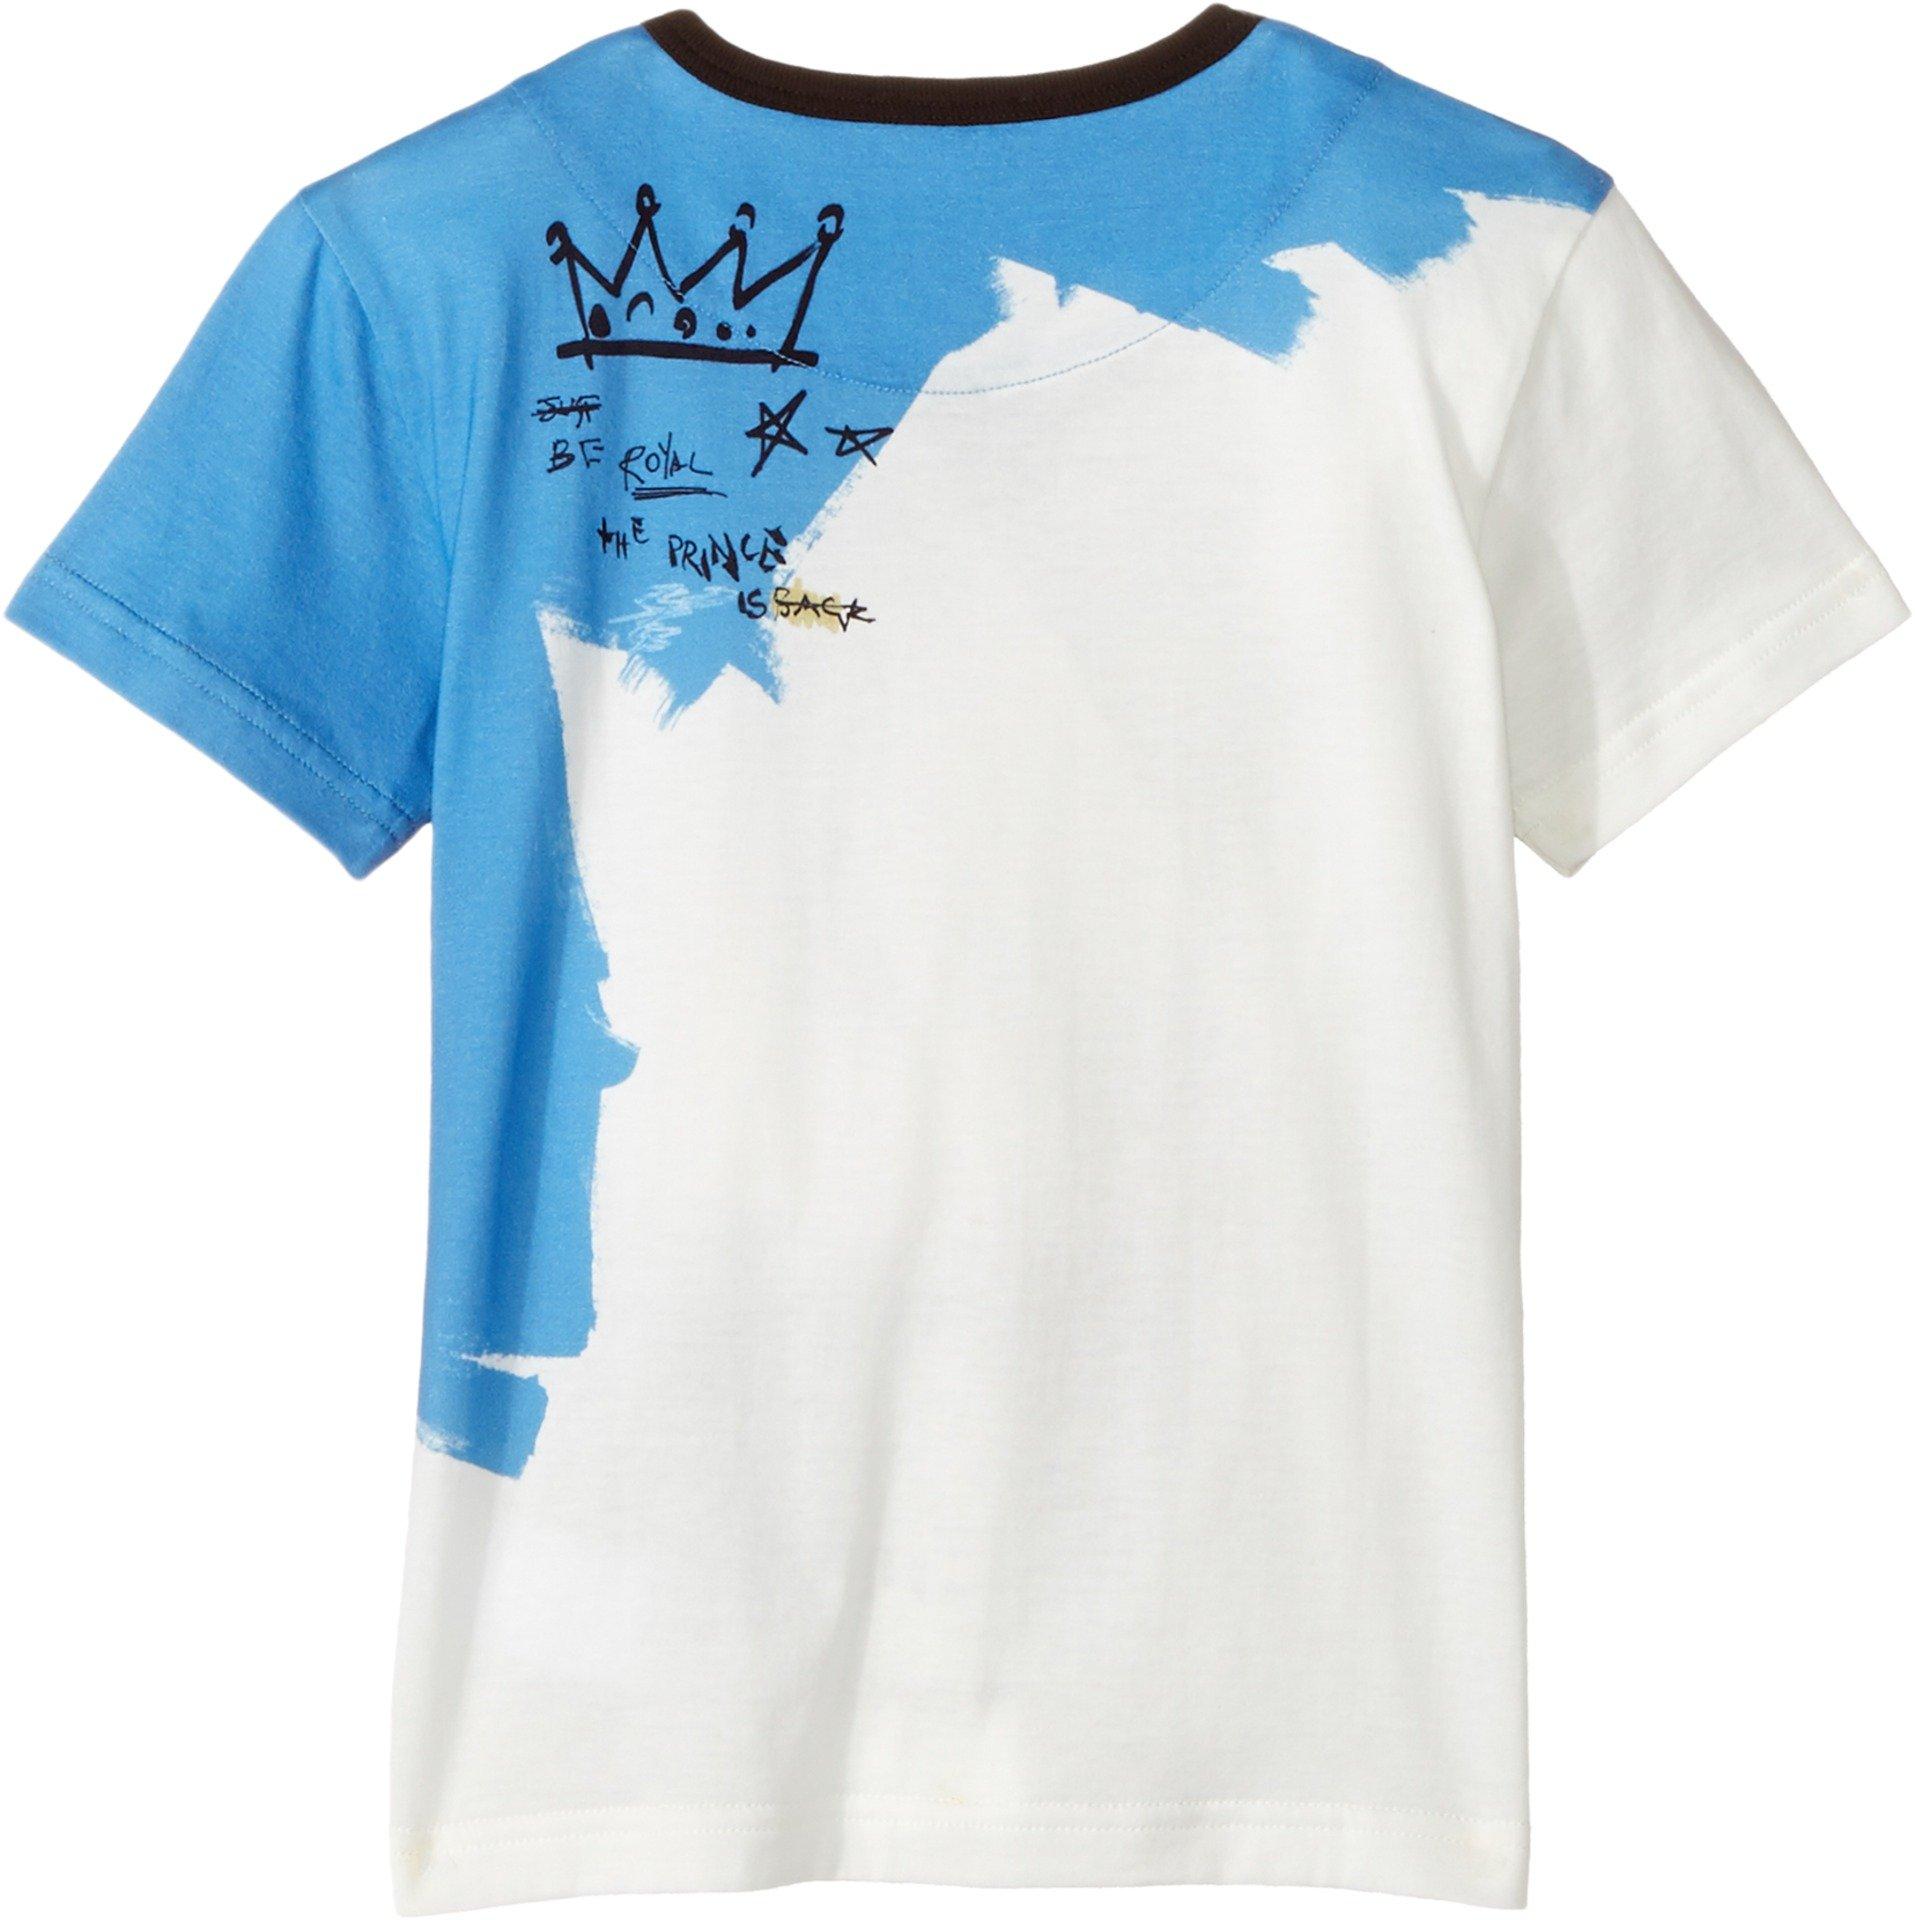 Dolce & Gabbana Kids Baby Boy's Just Be Royal T-Shirt (Toddler/Little Kids) White Print 4T